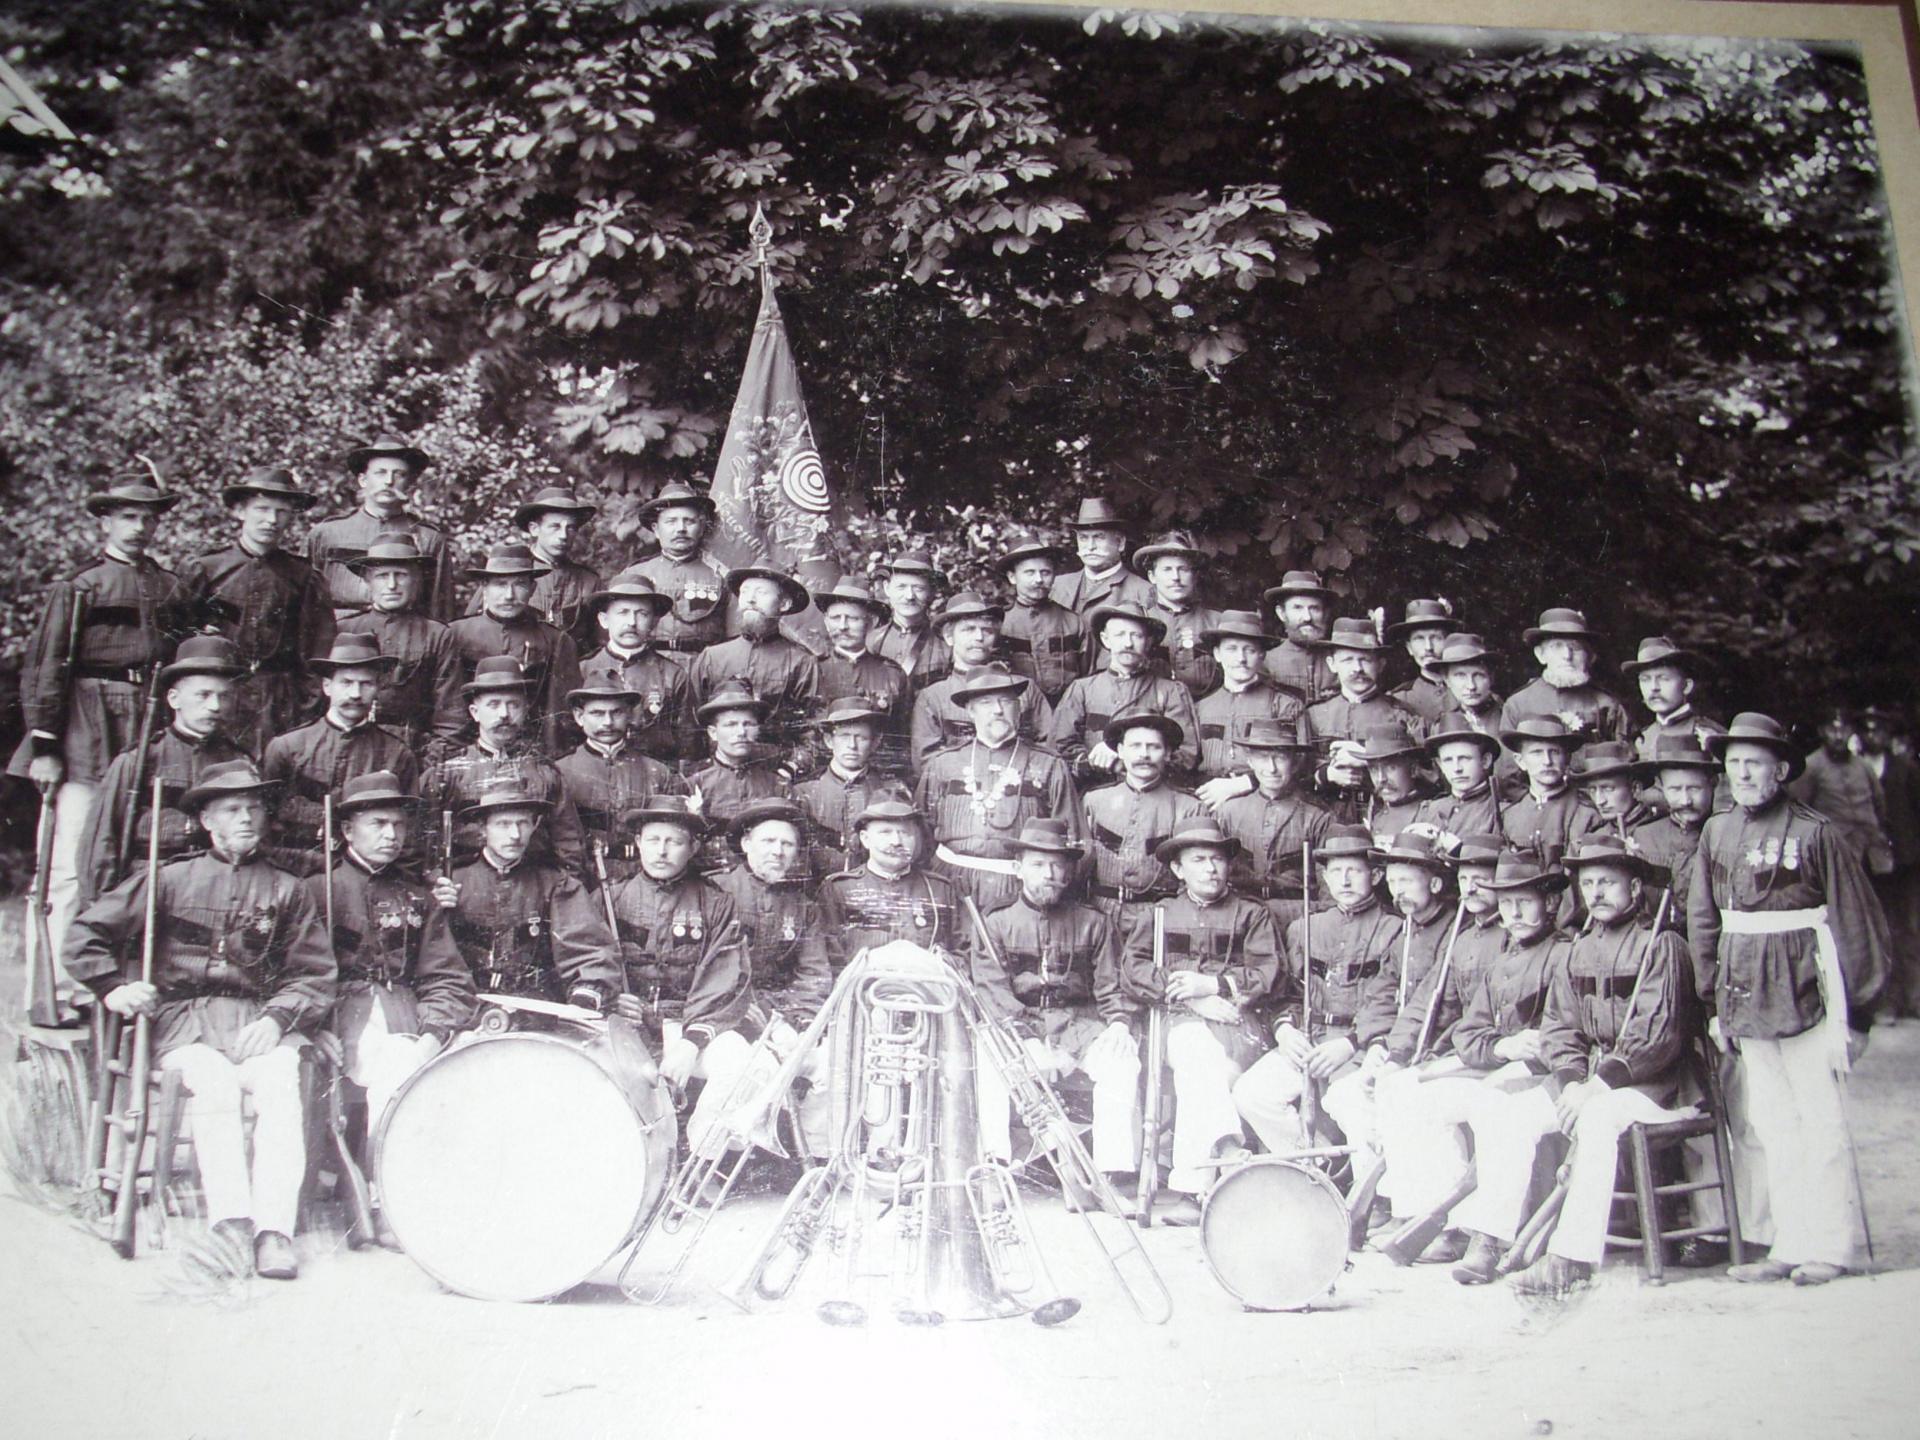 60-jähriges Jubiläum des Schützen-Corps Neuenkirchen